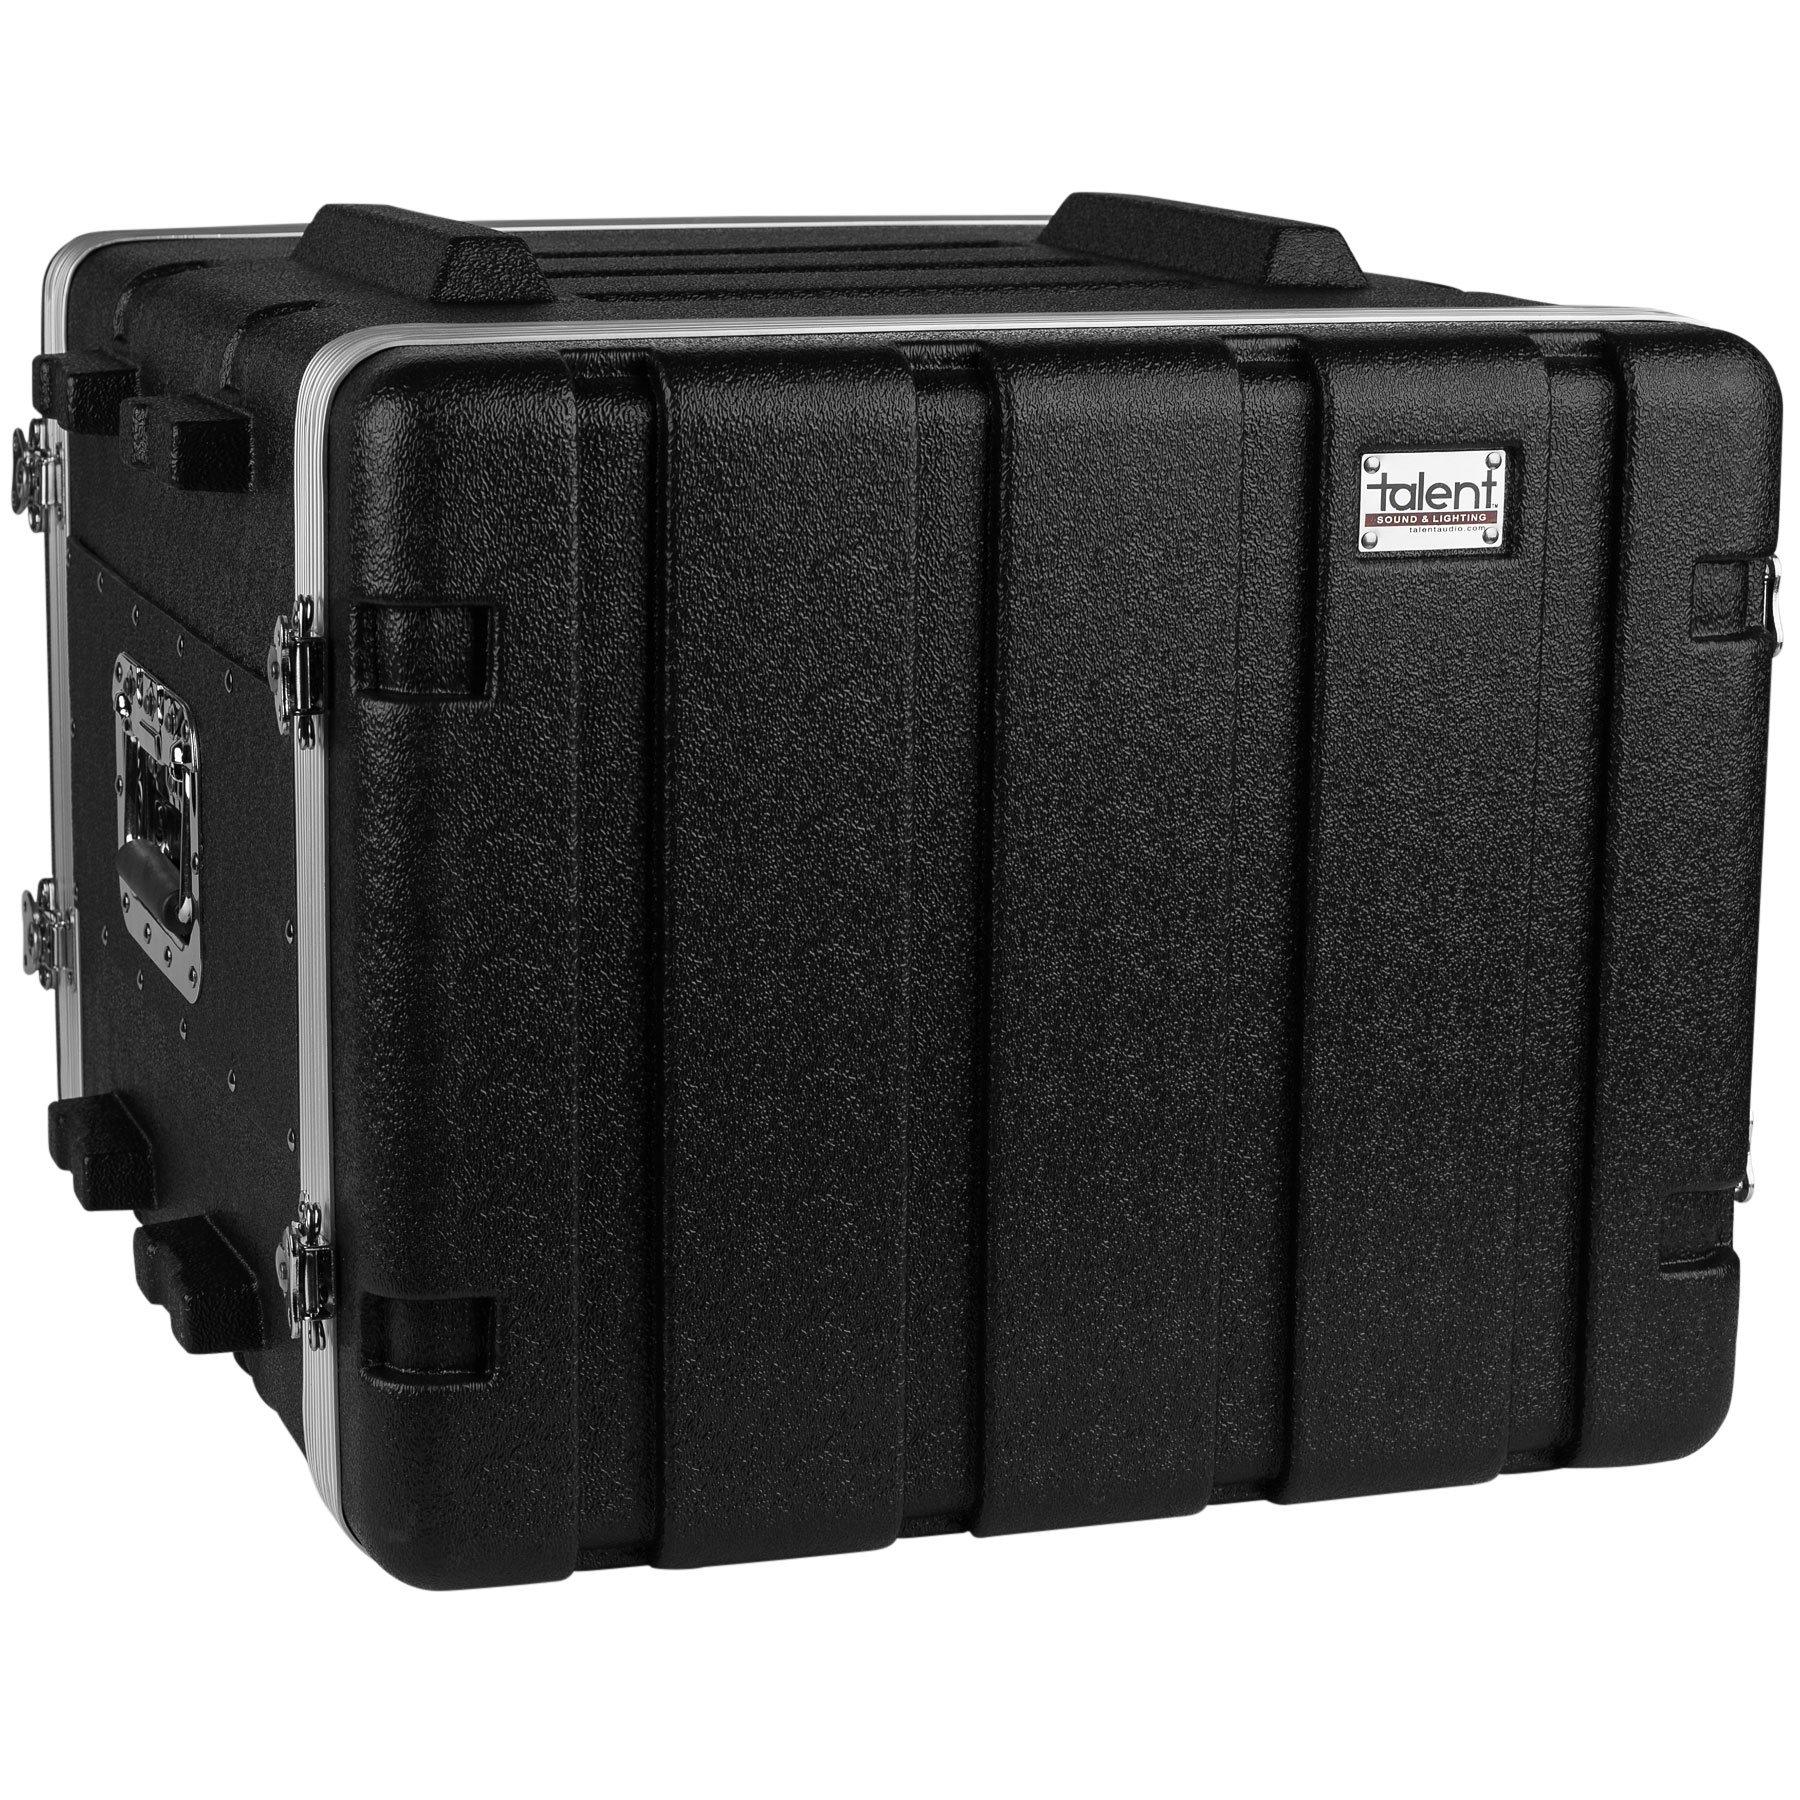 Talent RC8U19 ABS Rack Case 8U 19'' Depth